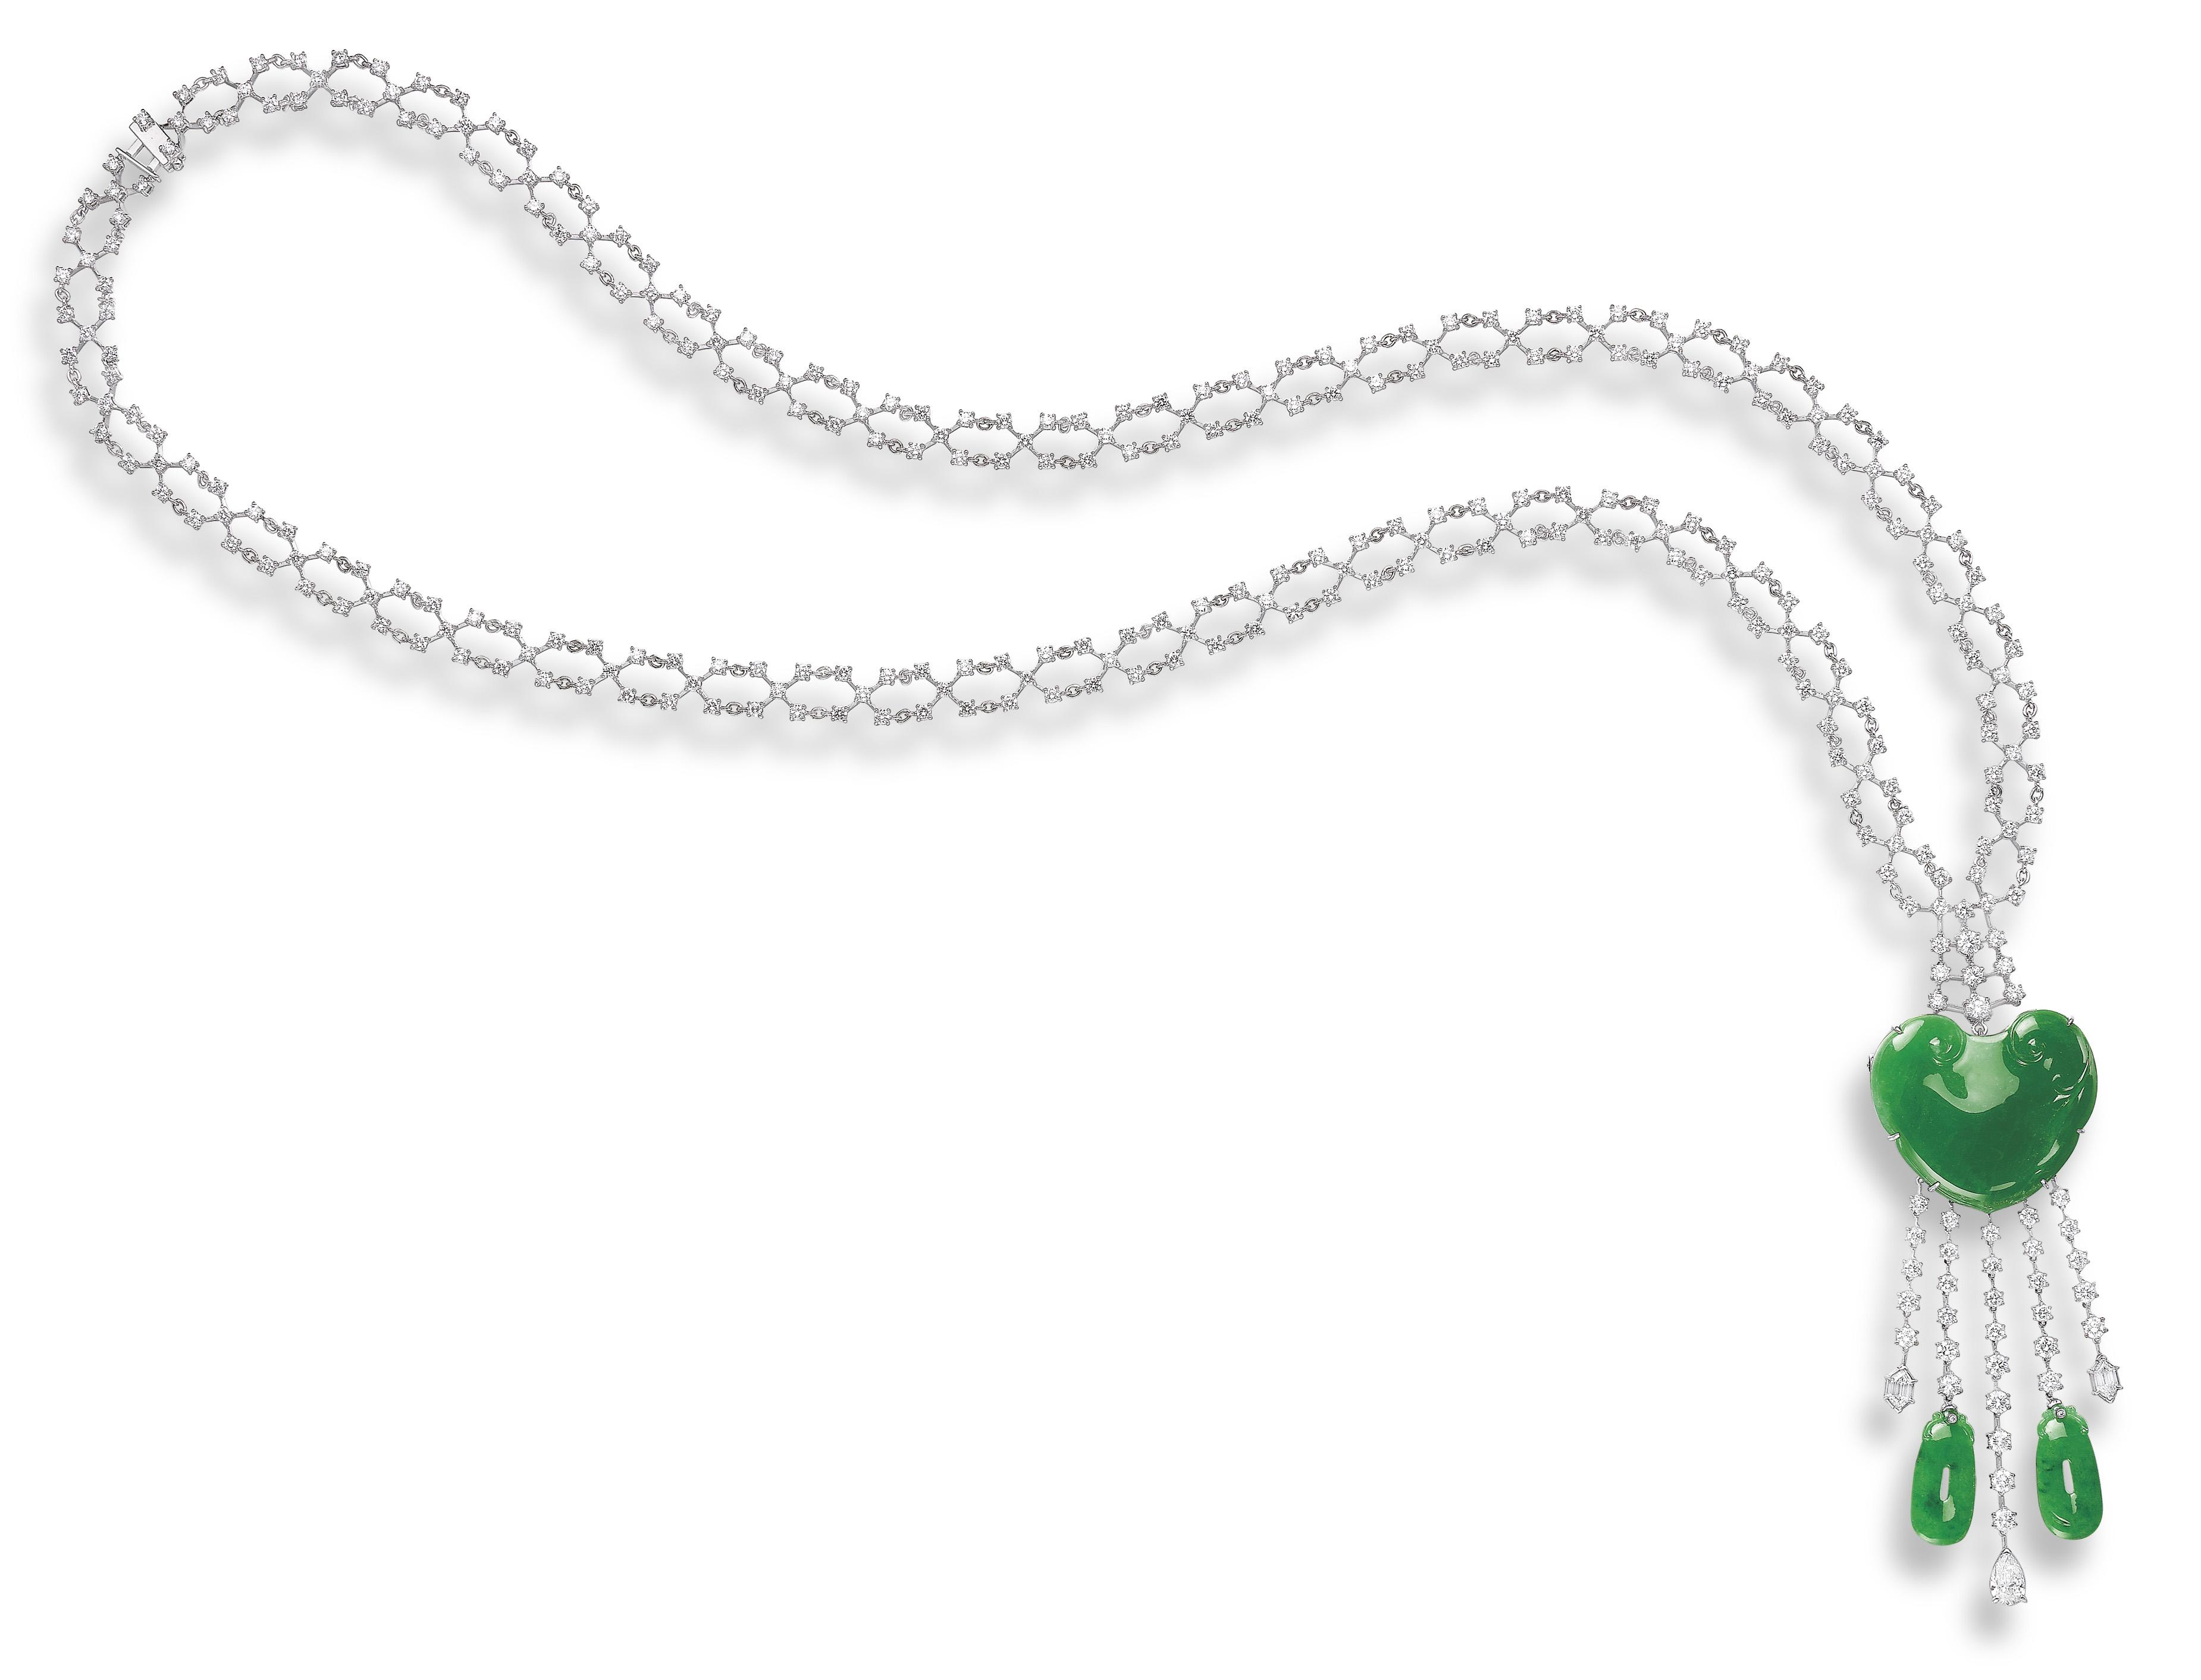 A JADEITE AND DIAMOND PENDENT NECKLACE, BY MITSUO KAJI